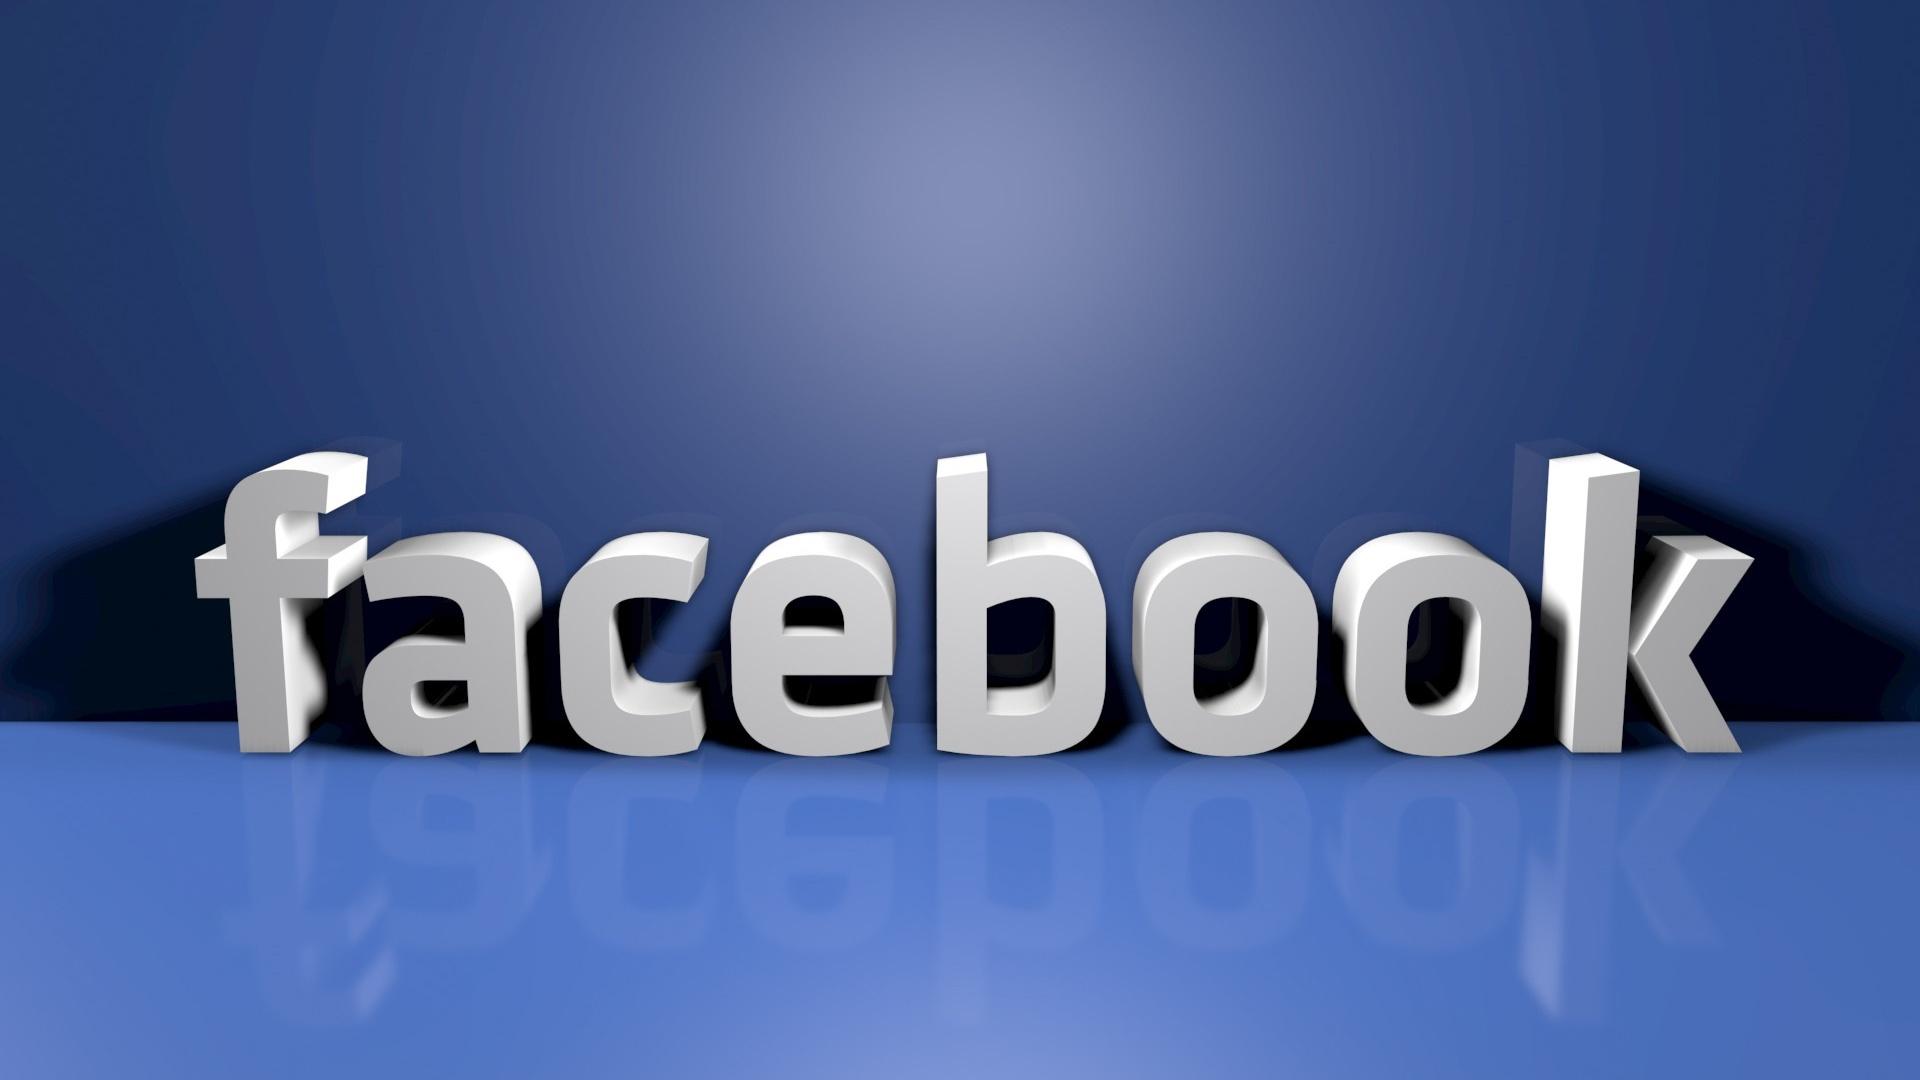 iniciar sesión en facebook en español